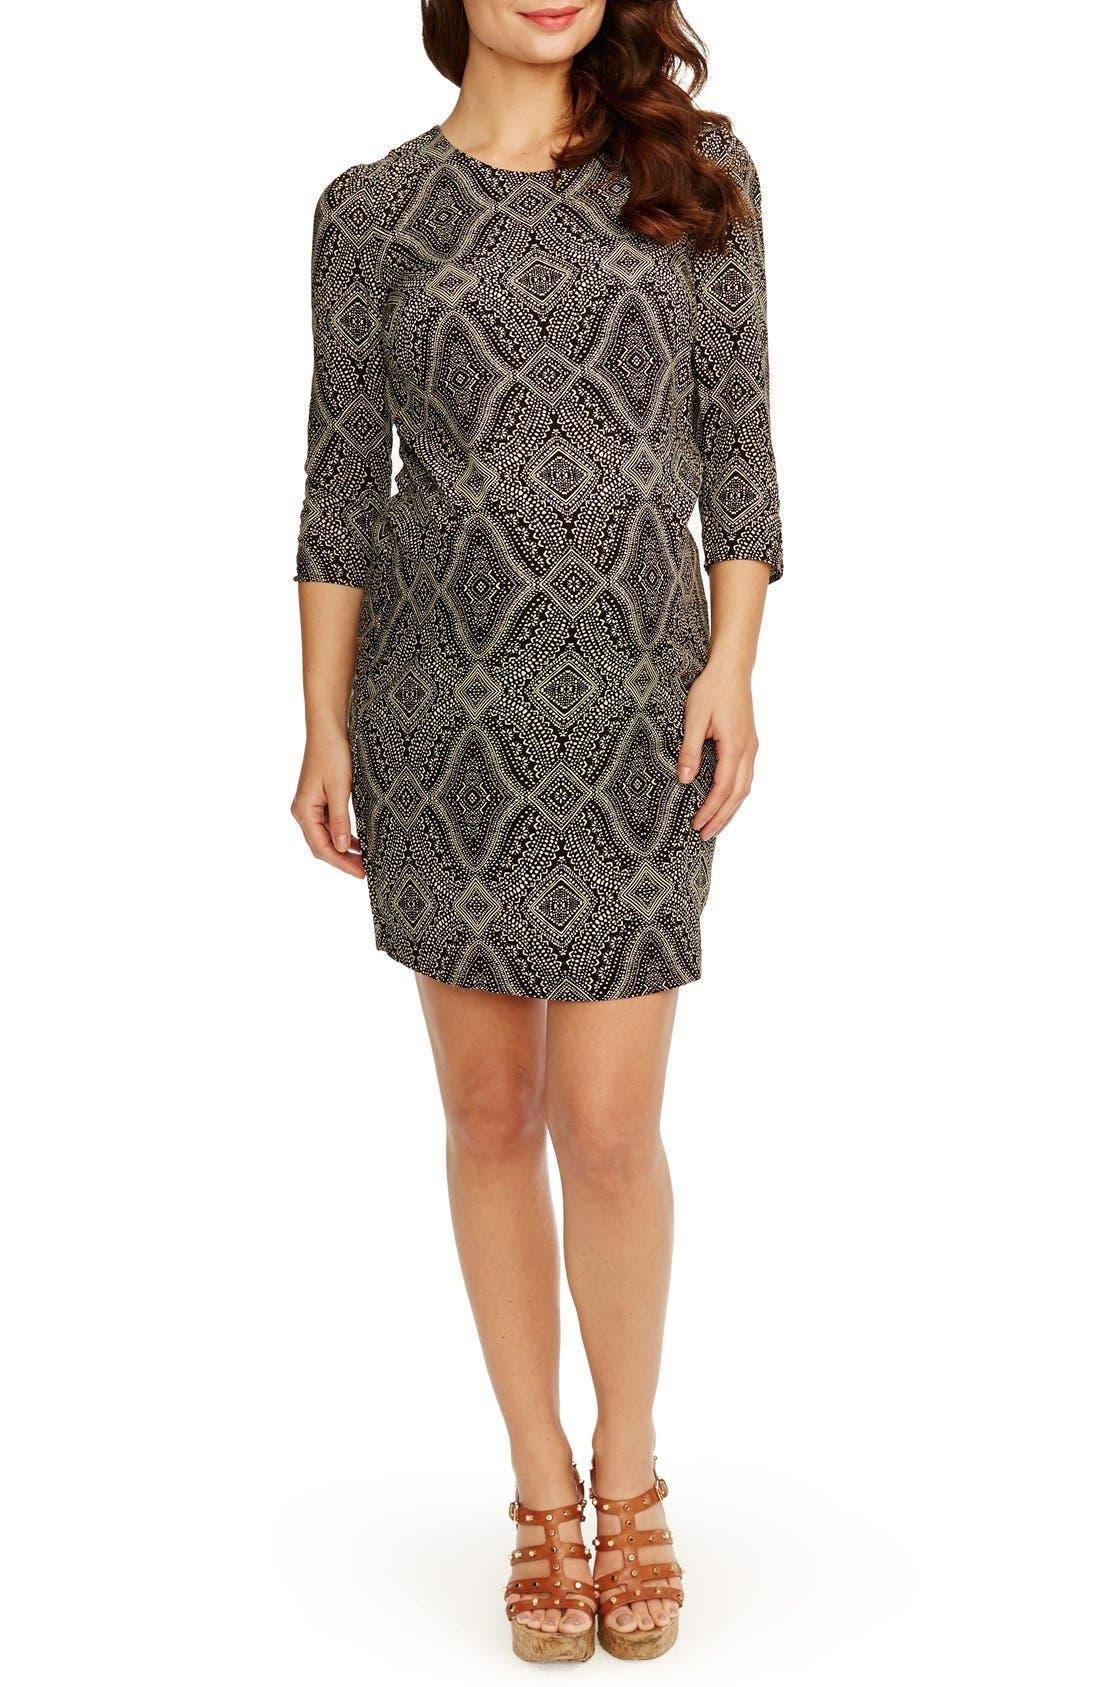 'SLOANE' MATERNITY DRESS